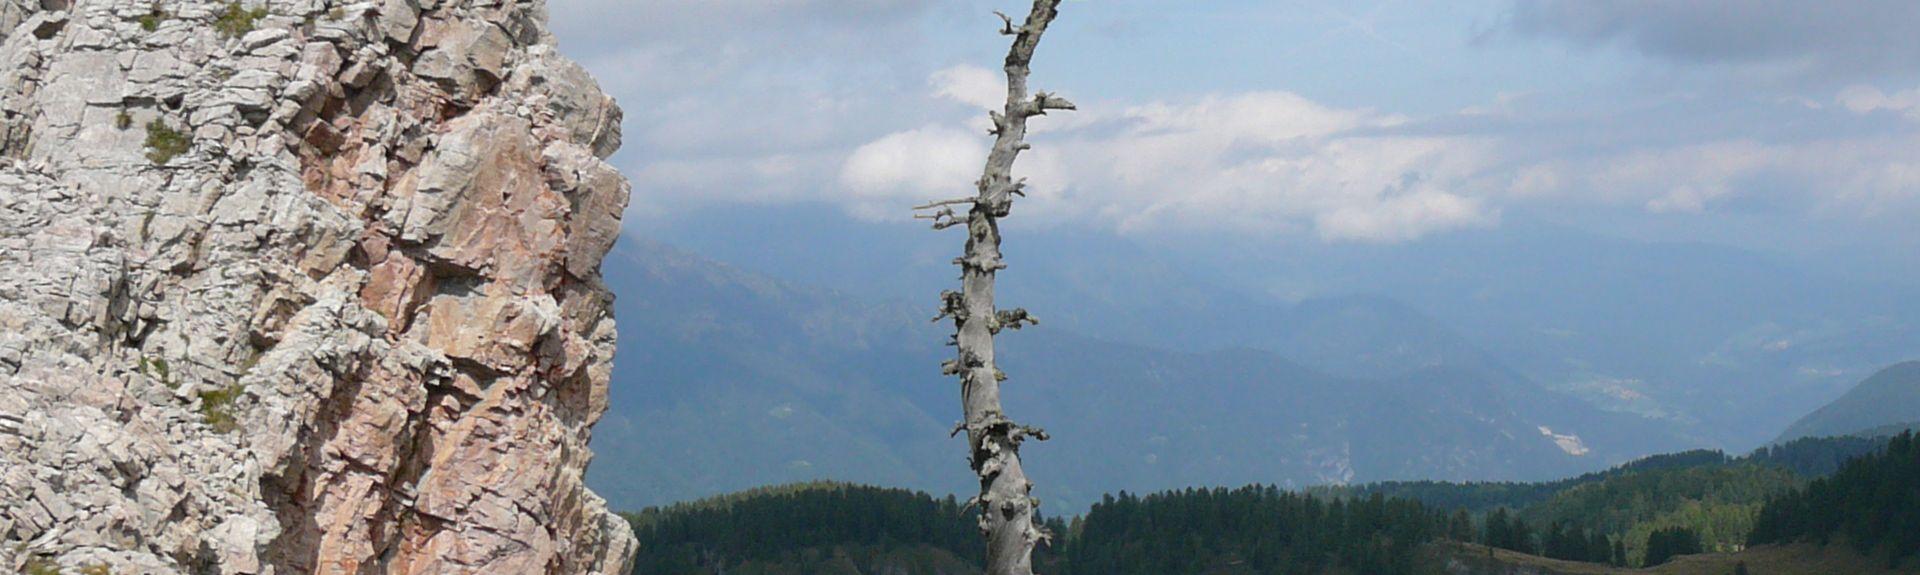 Sporminore, Trento, Trentino-Alto Adige/South Tyrol, Italy